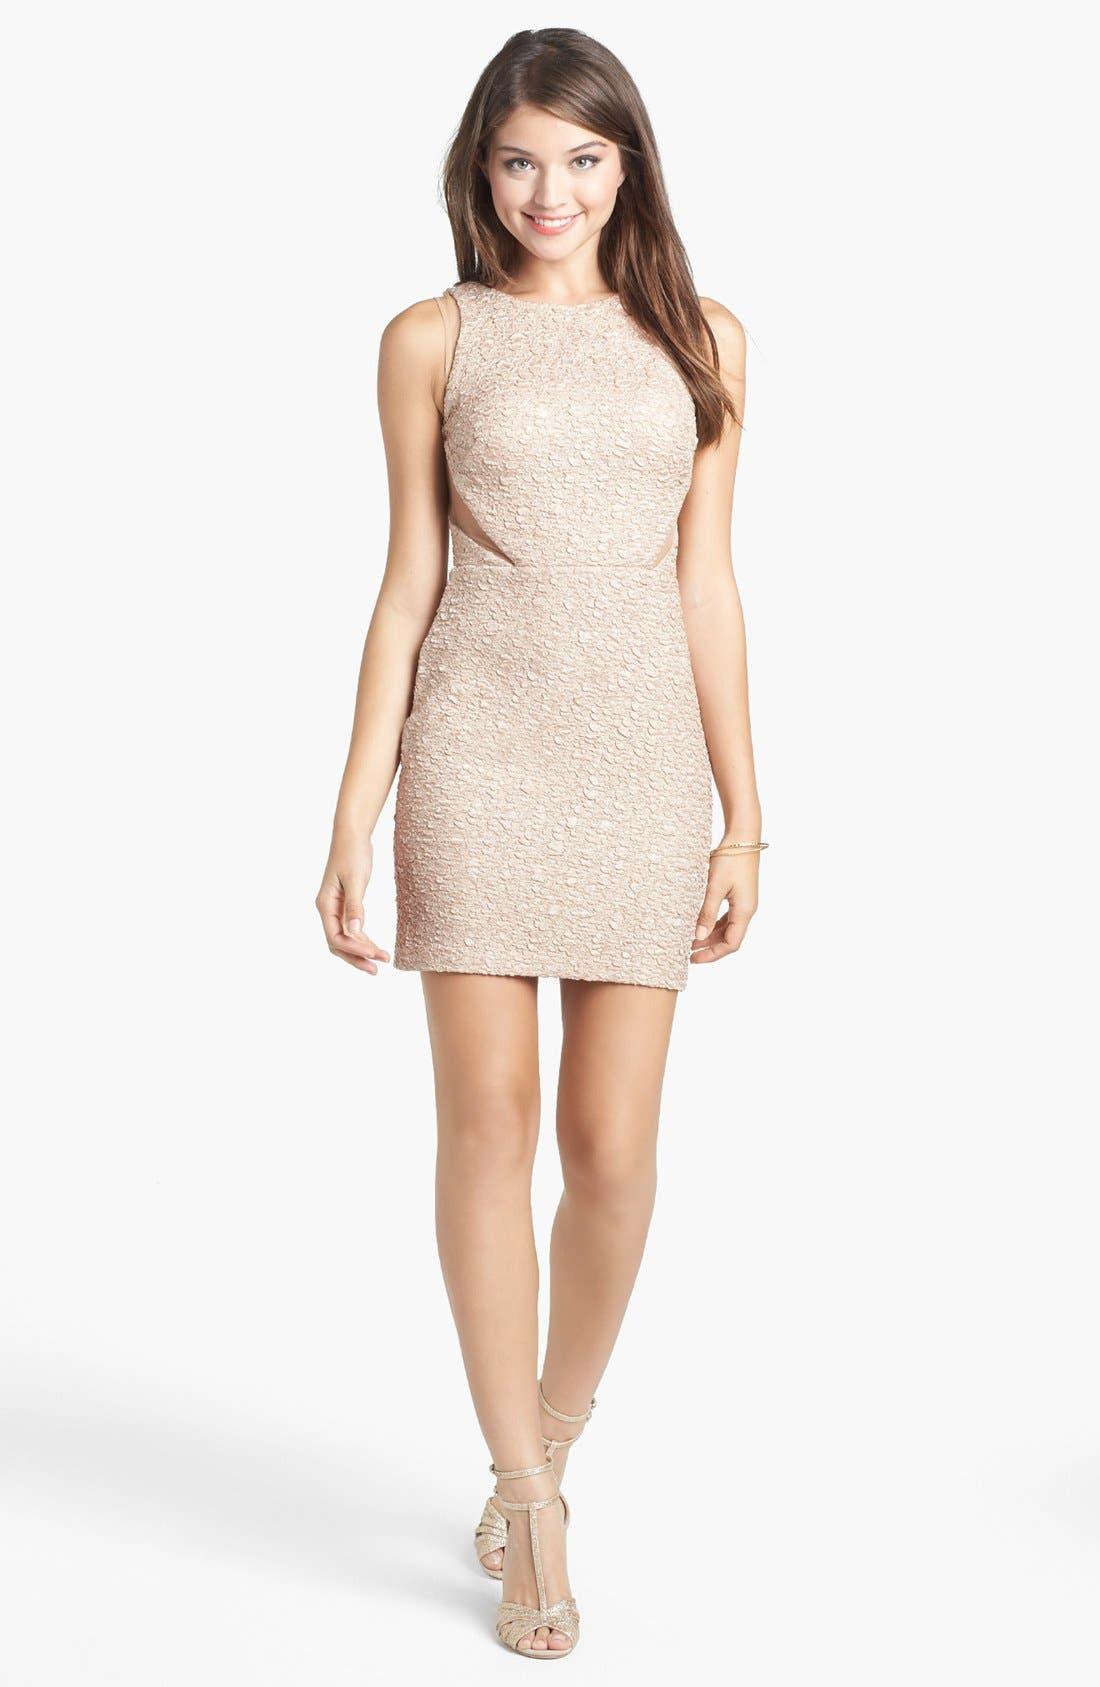 Main Image - Hailey Logan Illusion Panel Textured Body-Con Dress (Juniors)